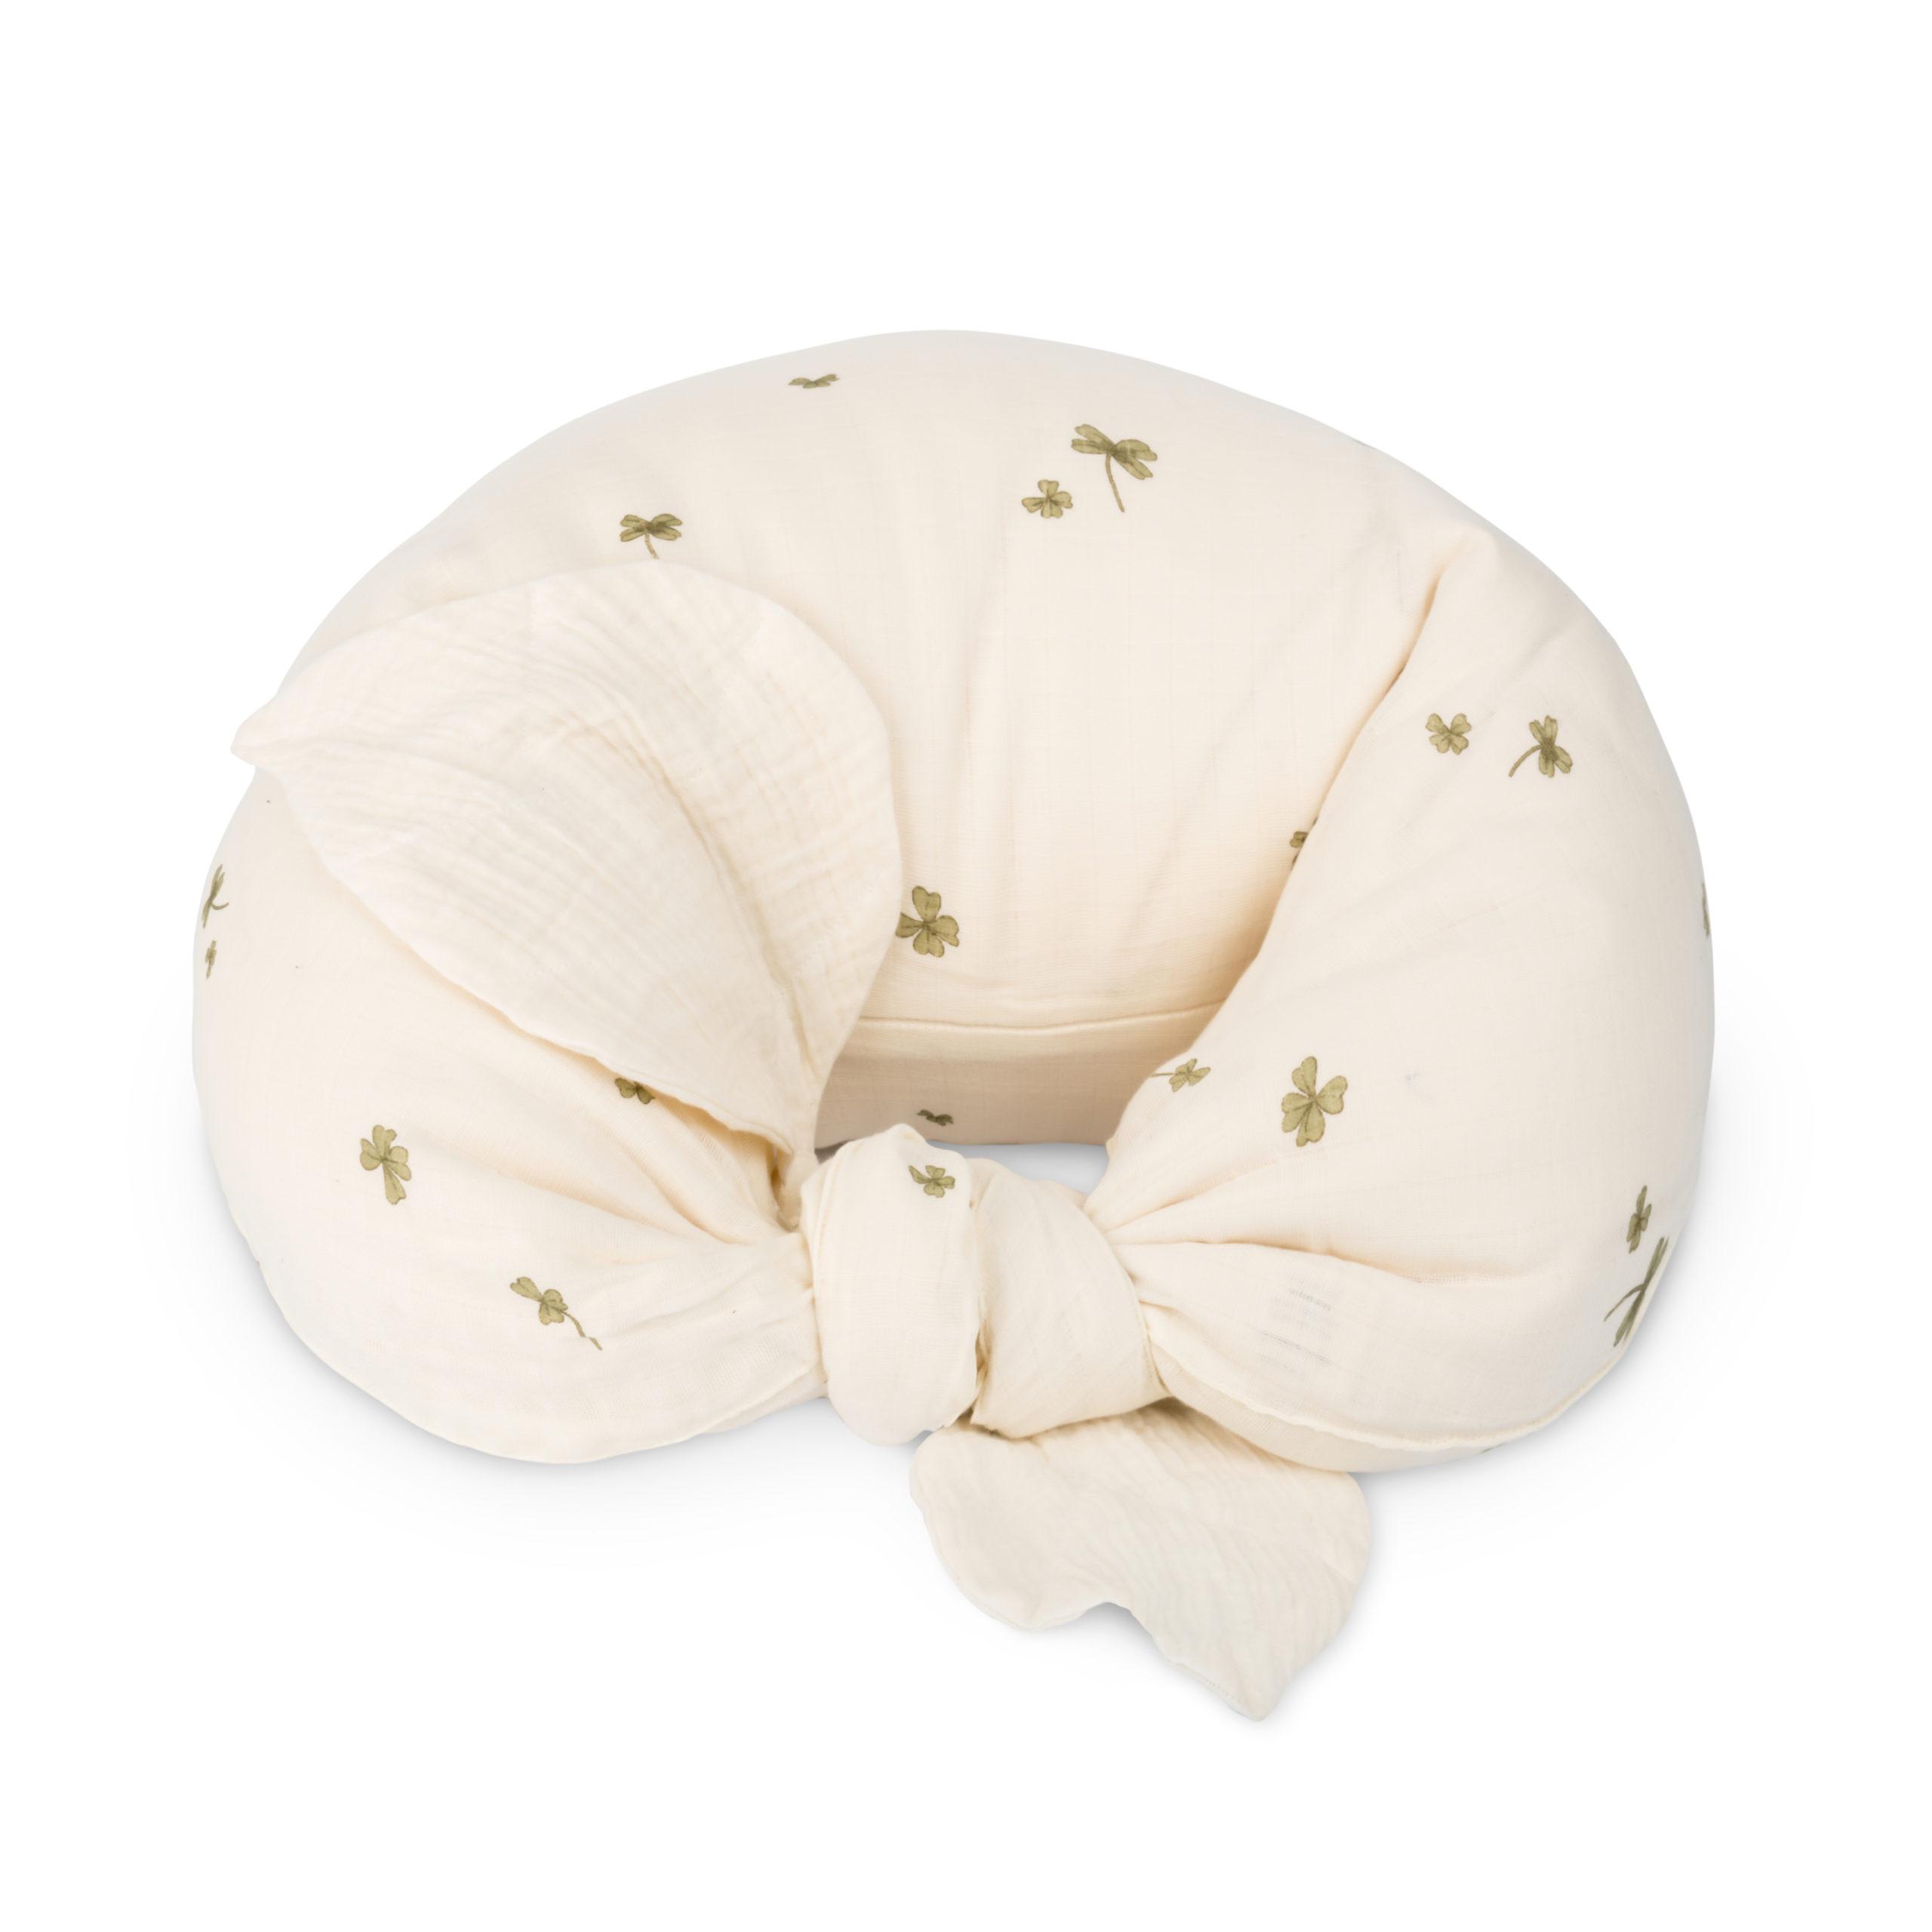 That's Mine - Nursing Pillow - Clover Meadow (NP73)